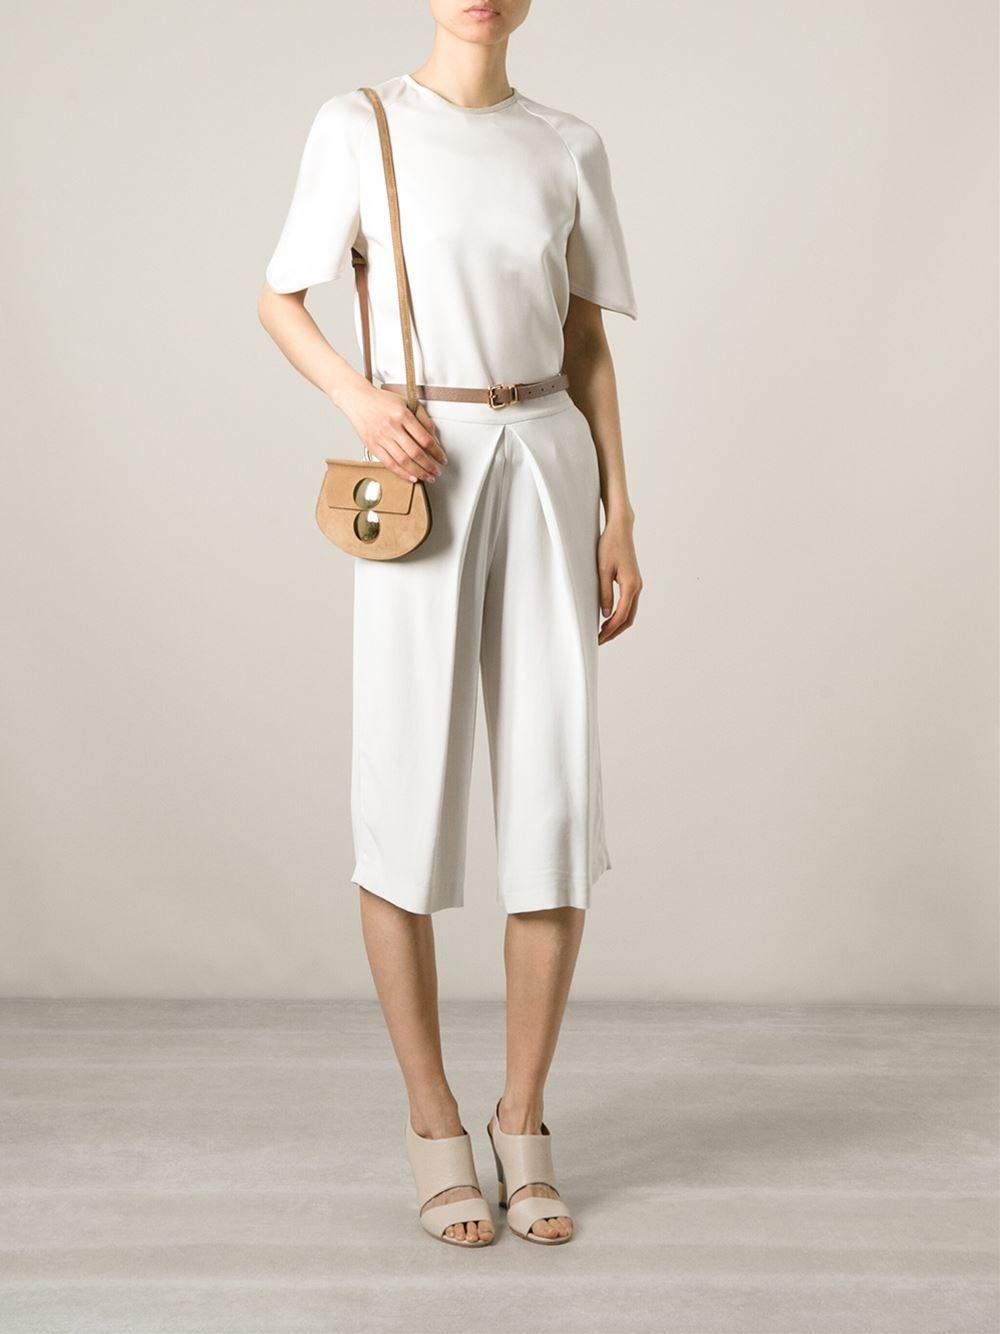 chloe elsie shoulder bag - chloe mini faye crossbody bag, chole purses